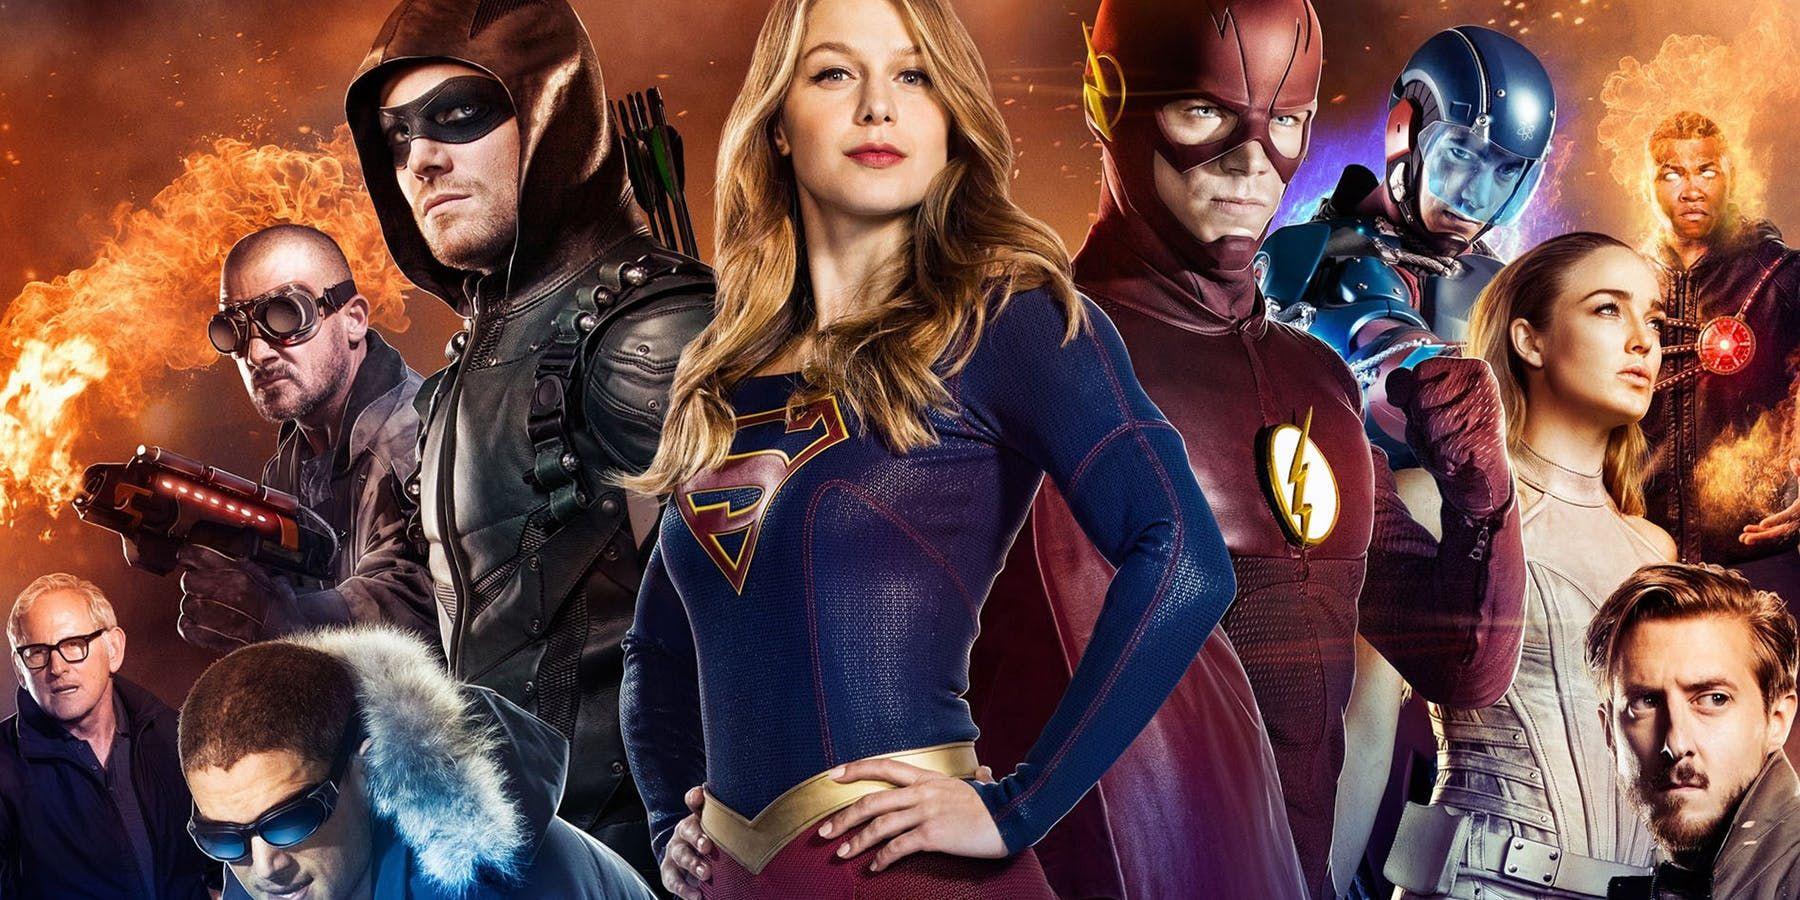 WBTV Unveils Official 2019 Comic-Con International Bag Designs